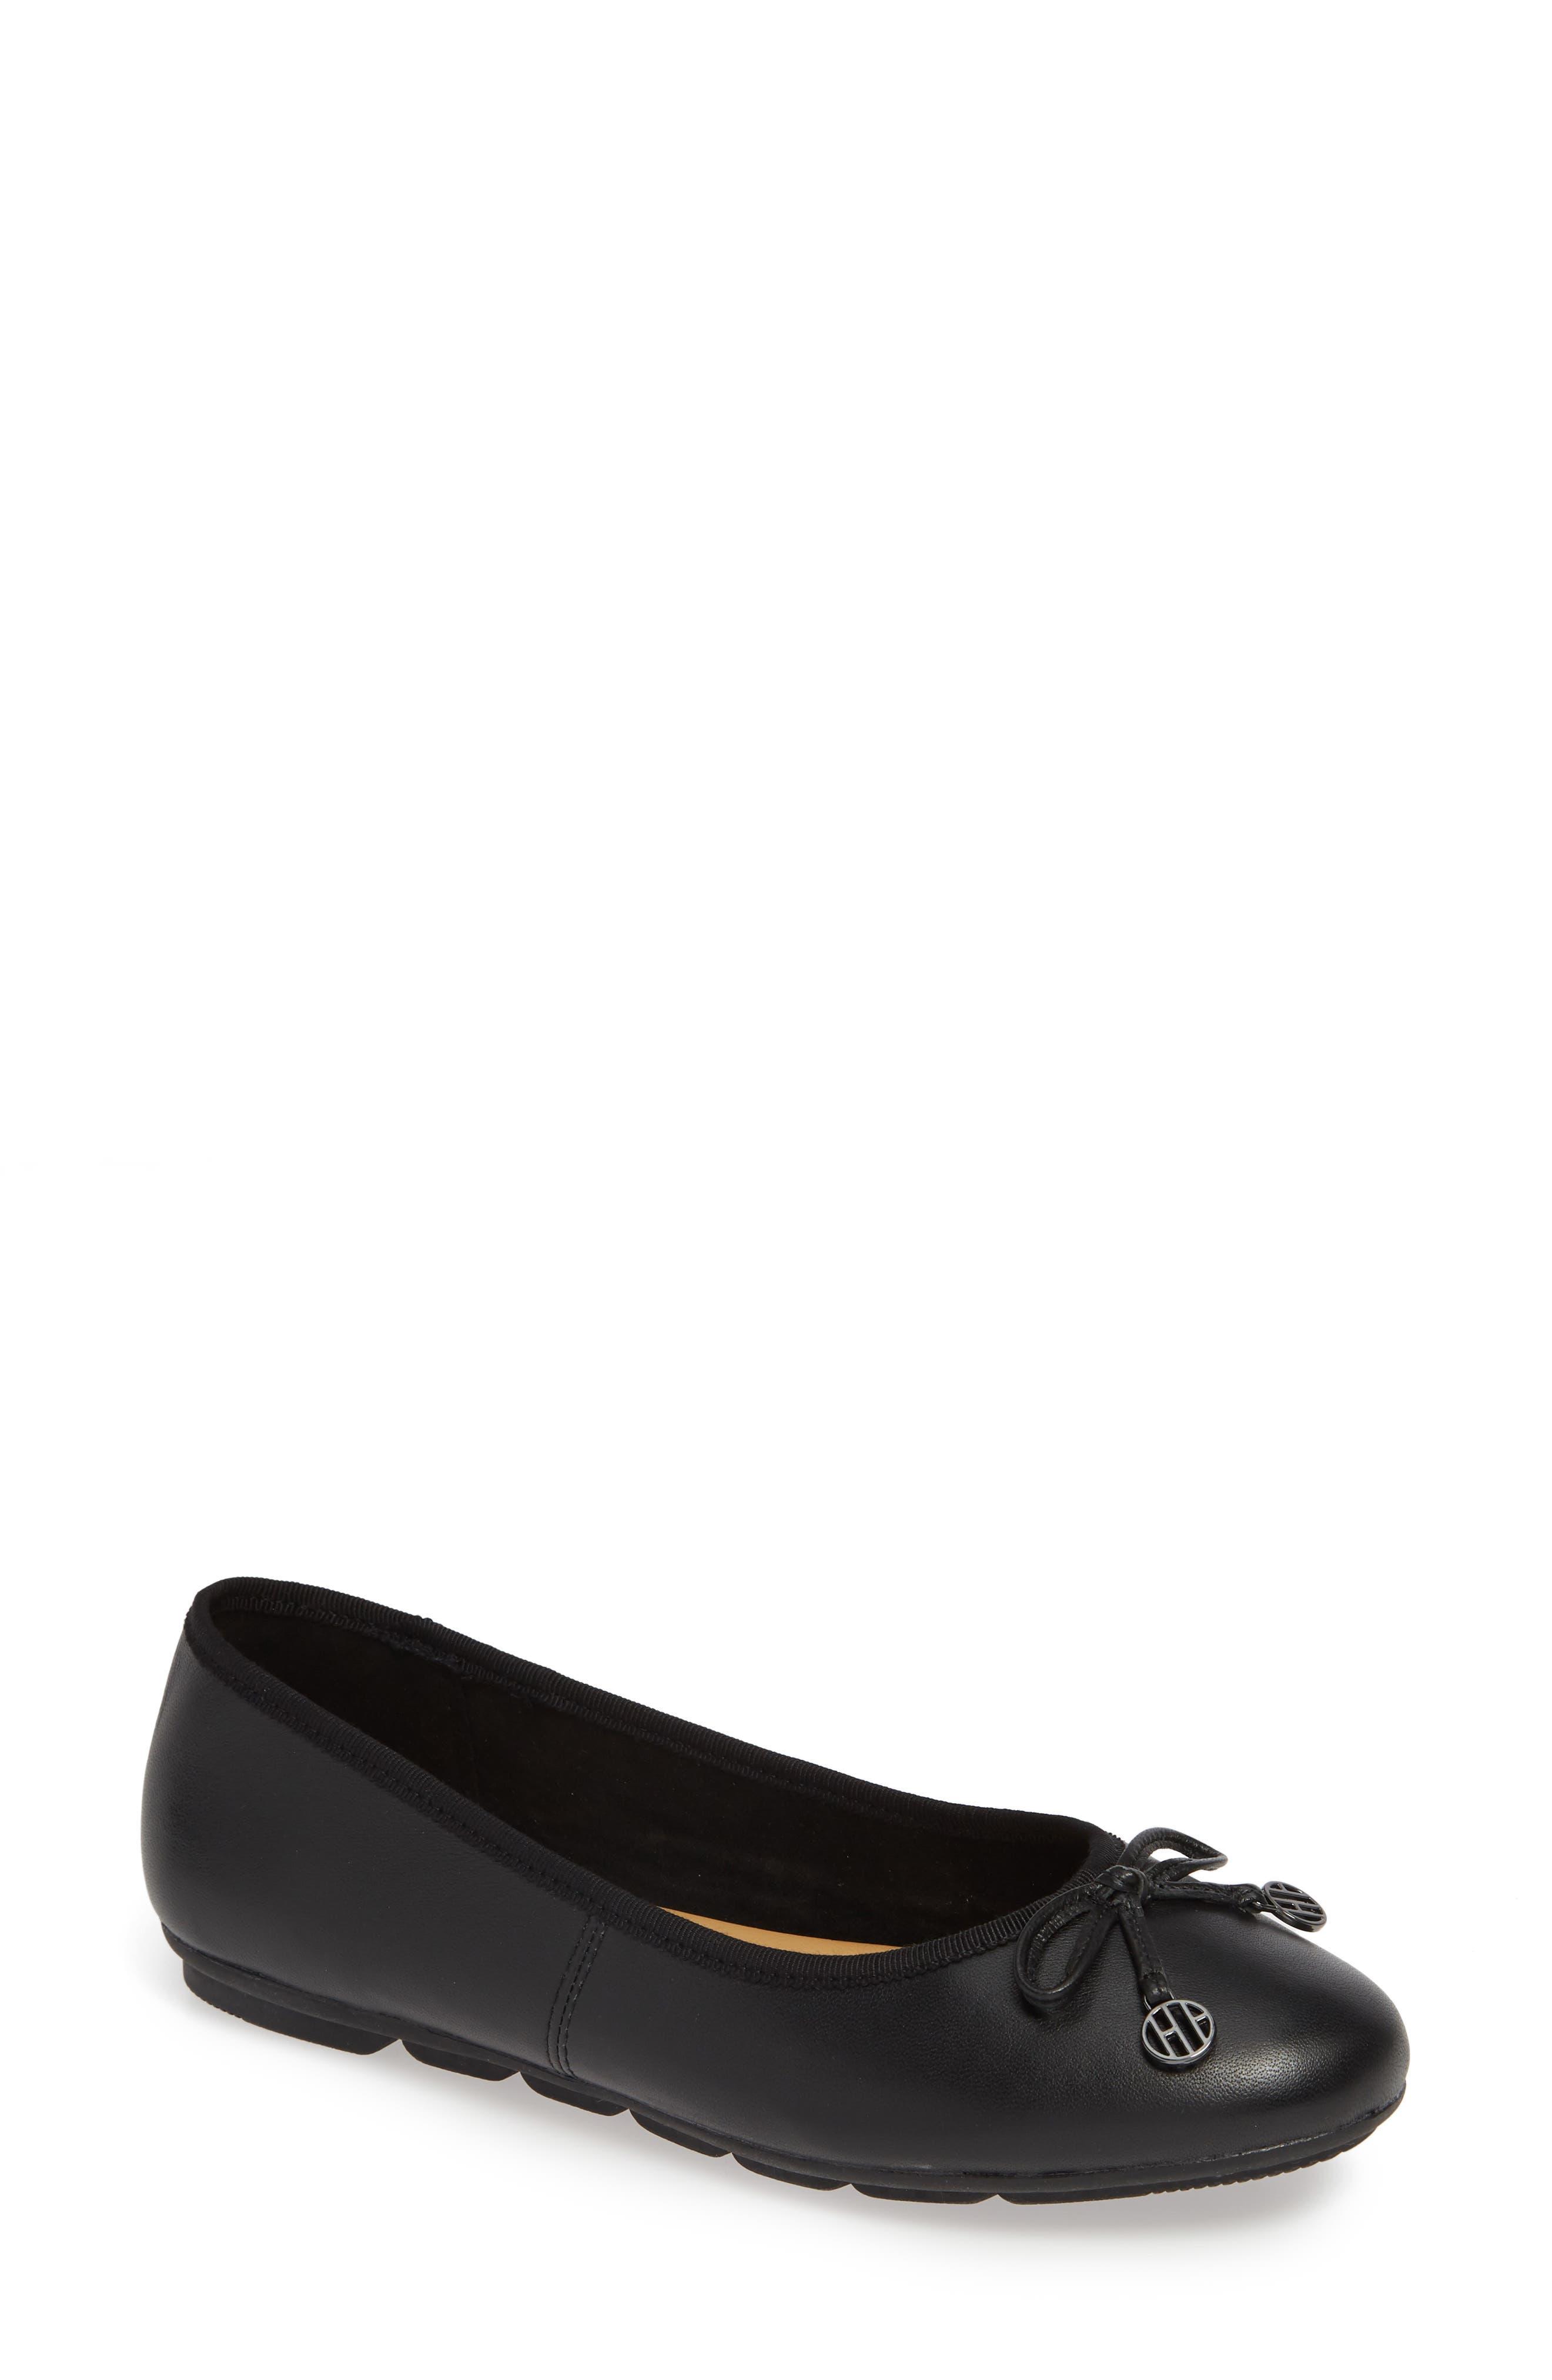 Hush Puppies Abbey Ballet Flat, Black